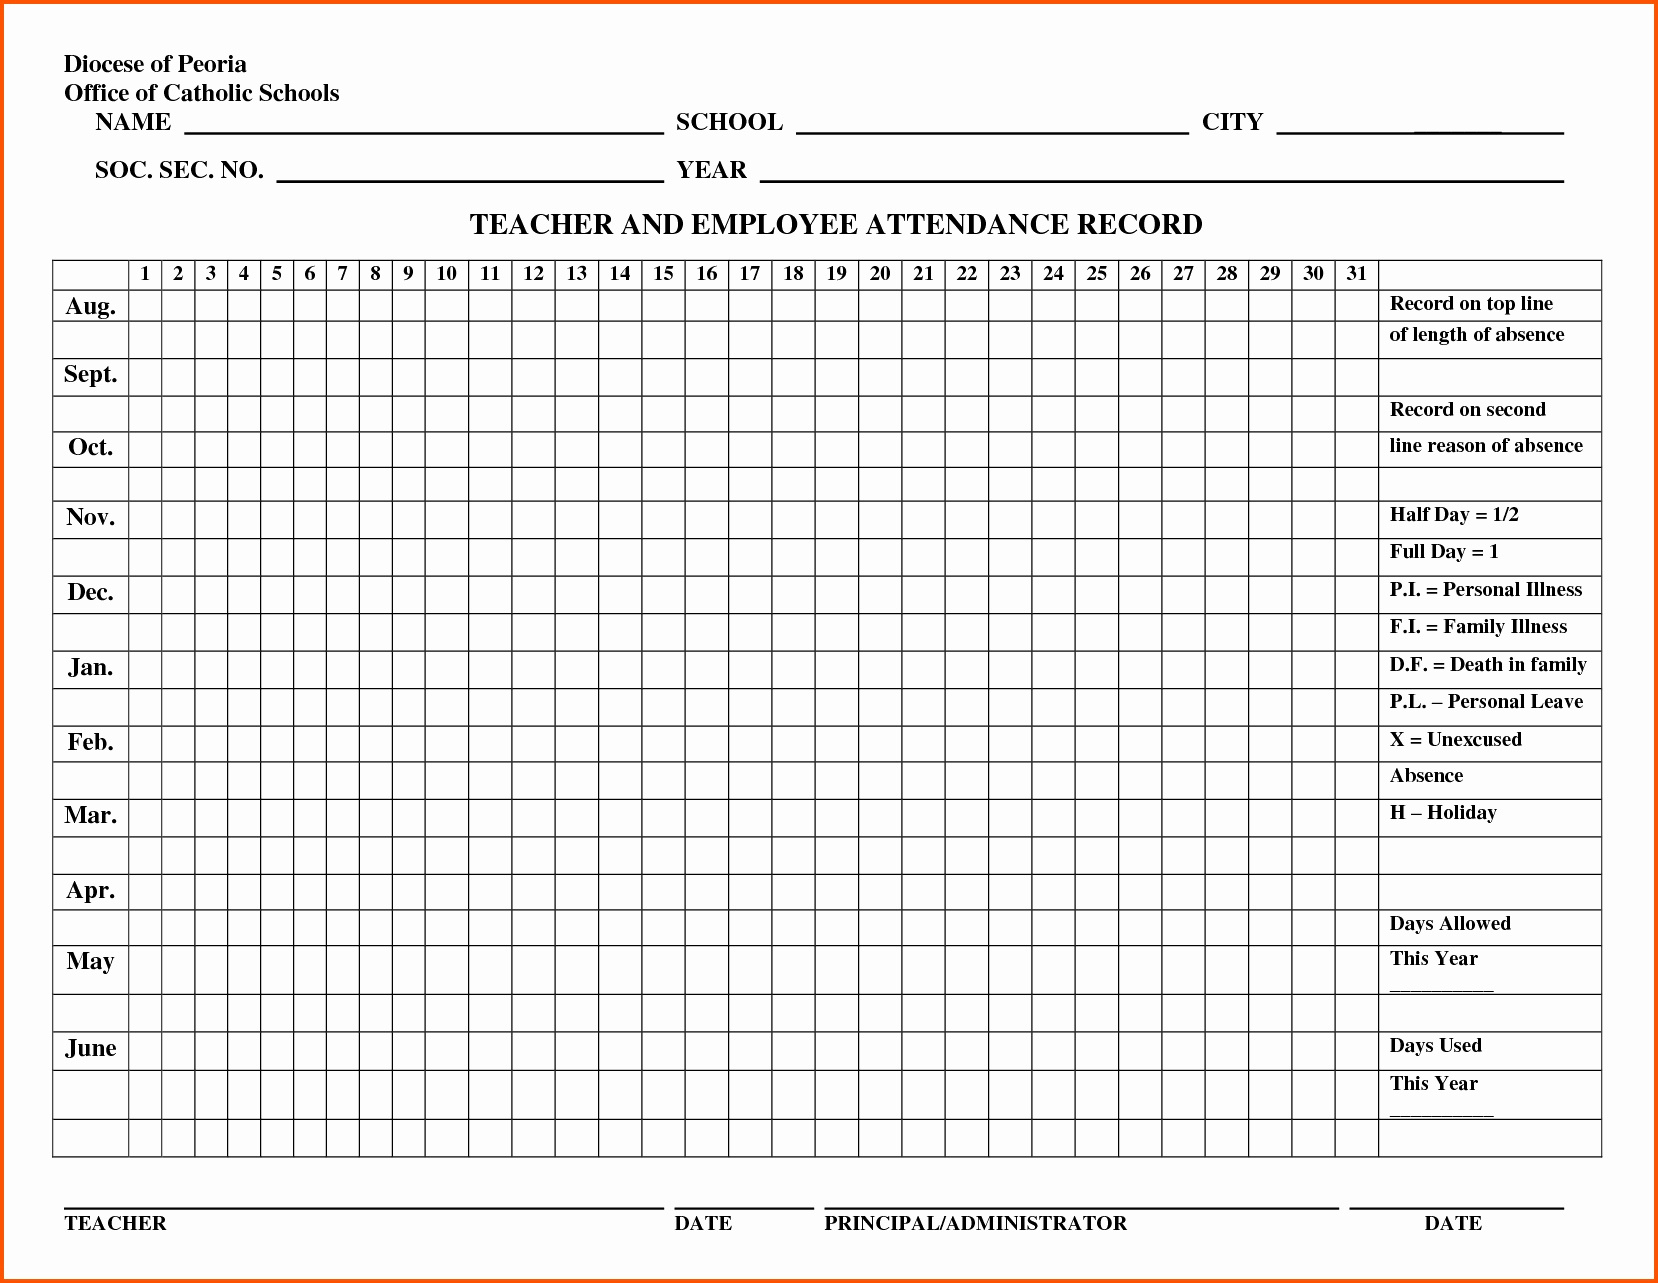 Fmla Rolling Calendar Tracking Spreadsheet With Regard To Fmla Rolling Calendar Tracking Spreadsheet Unique 60 Unique Fmla